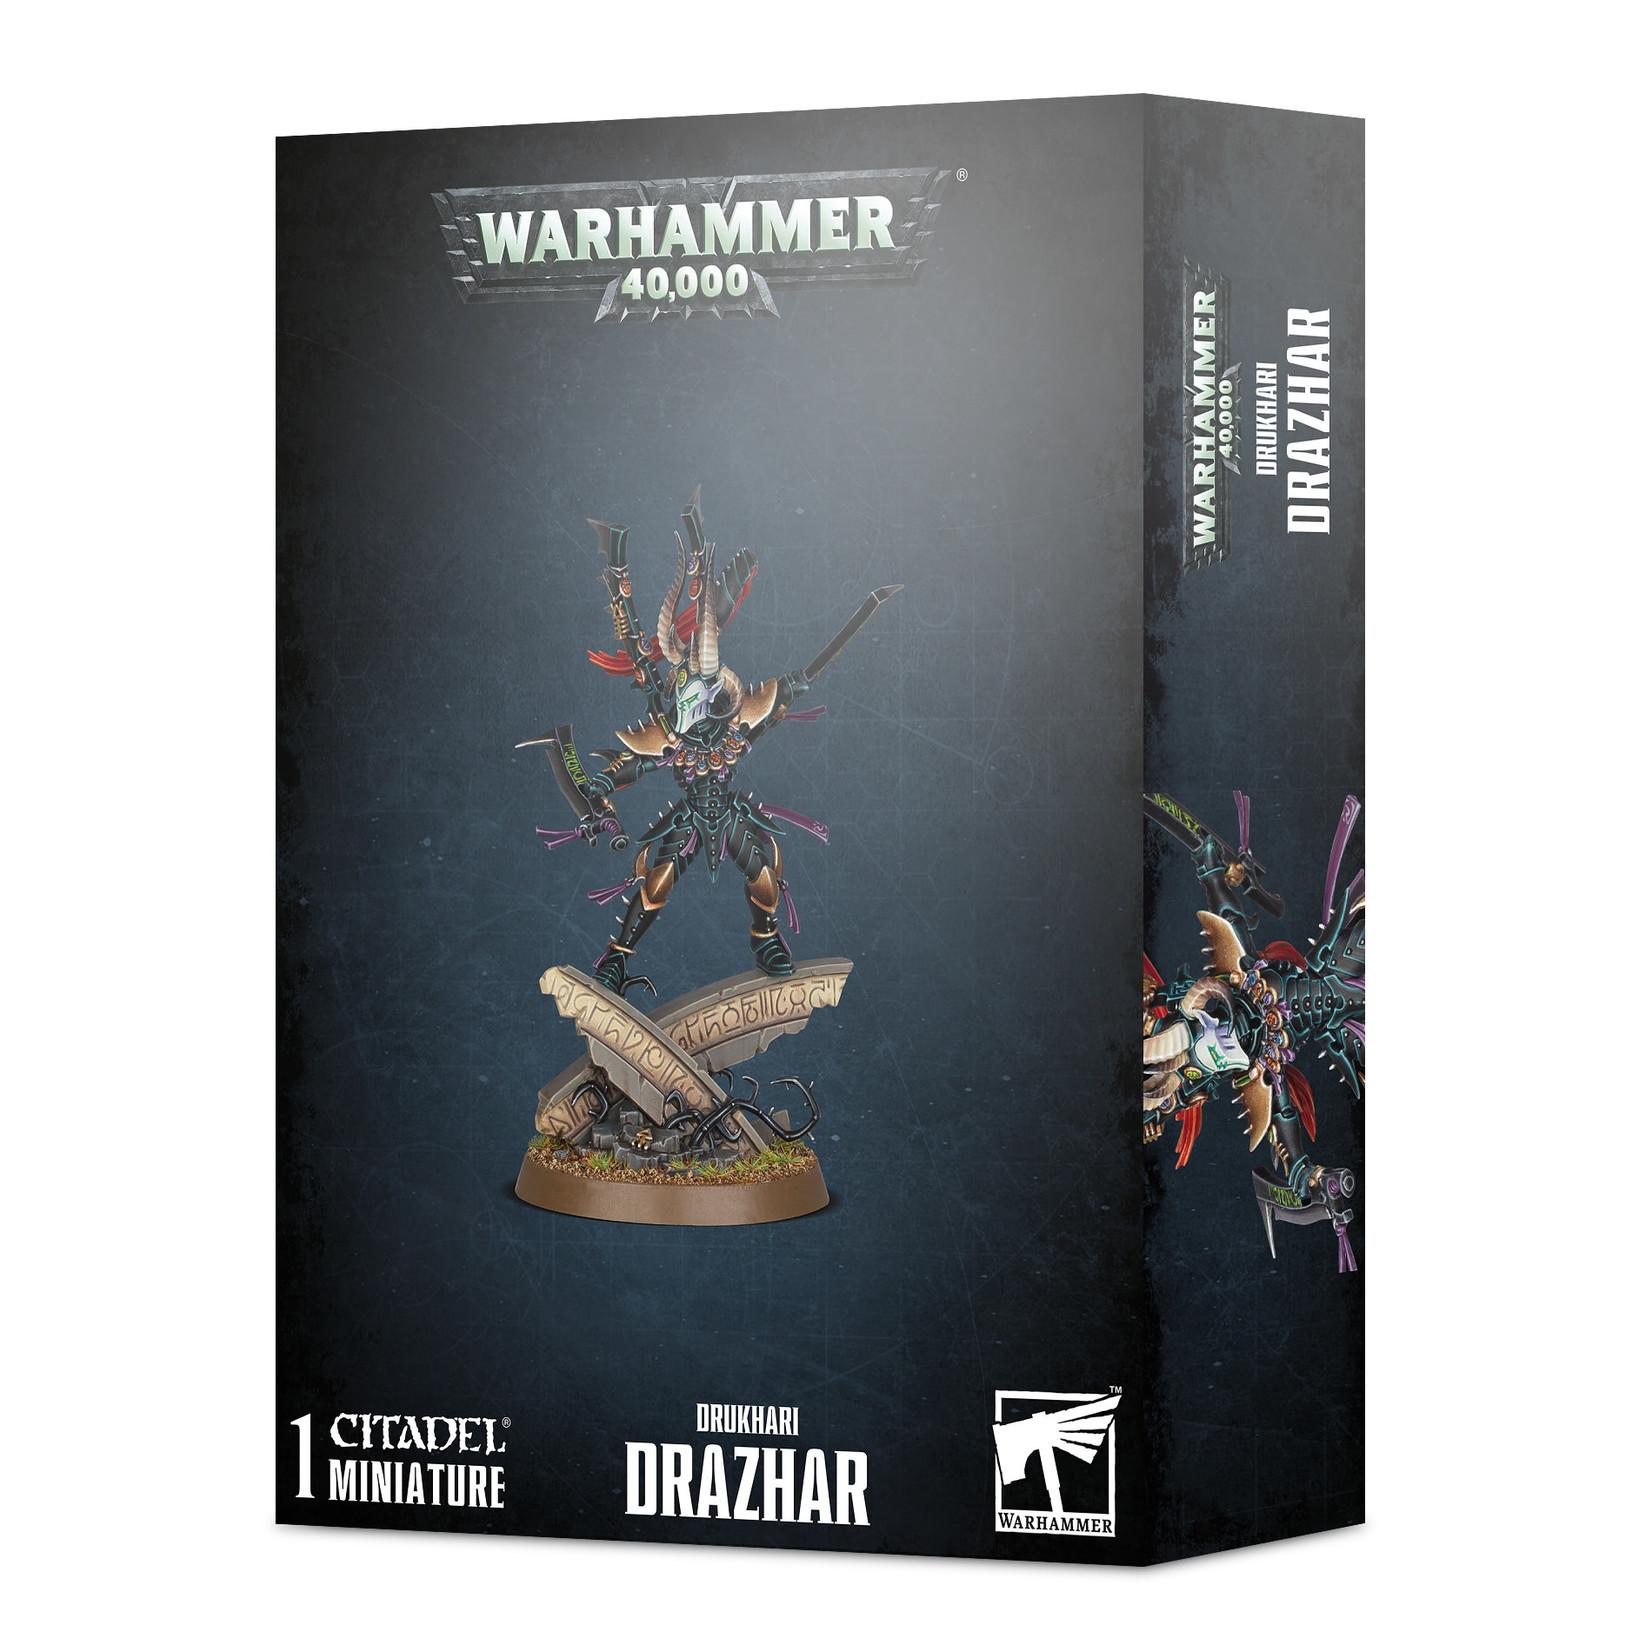 Games Workshop Warhammer 40k: Druhkari - Drazhar